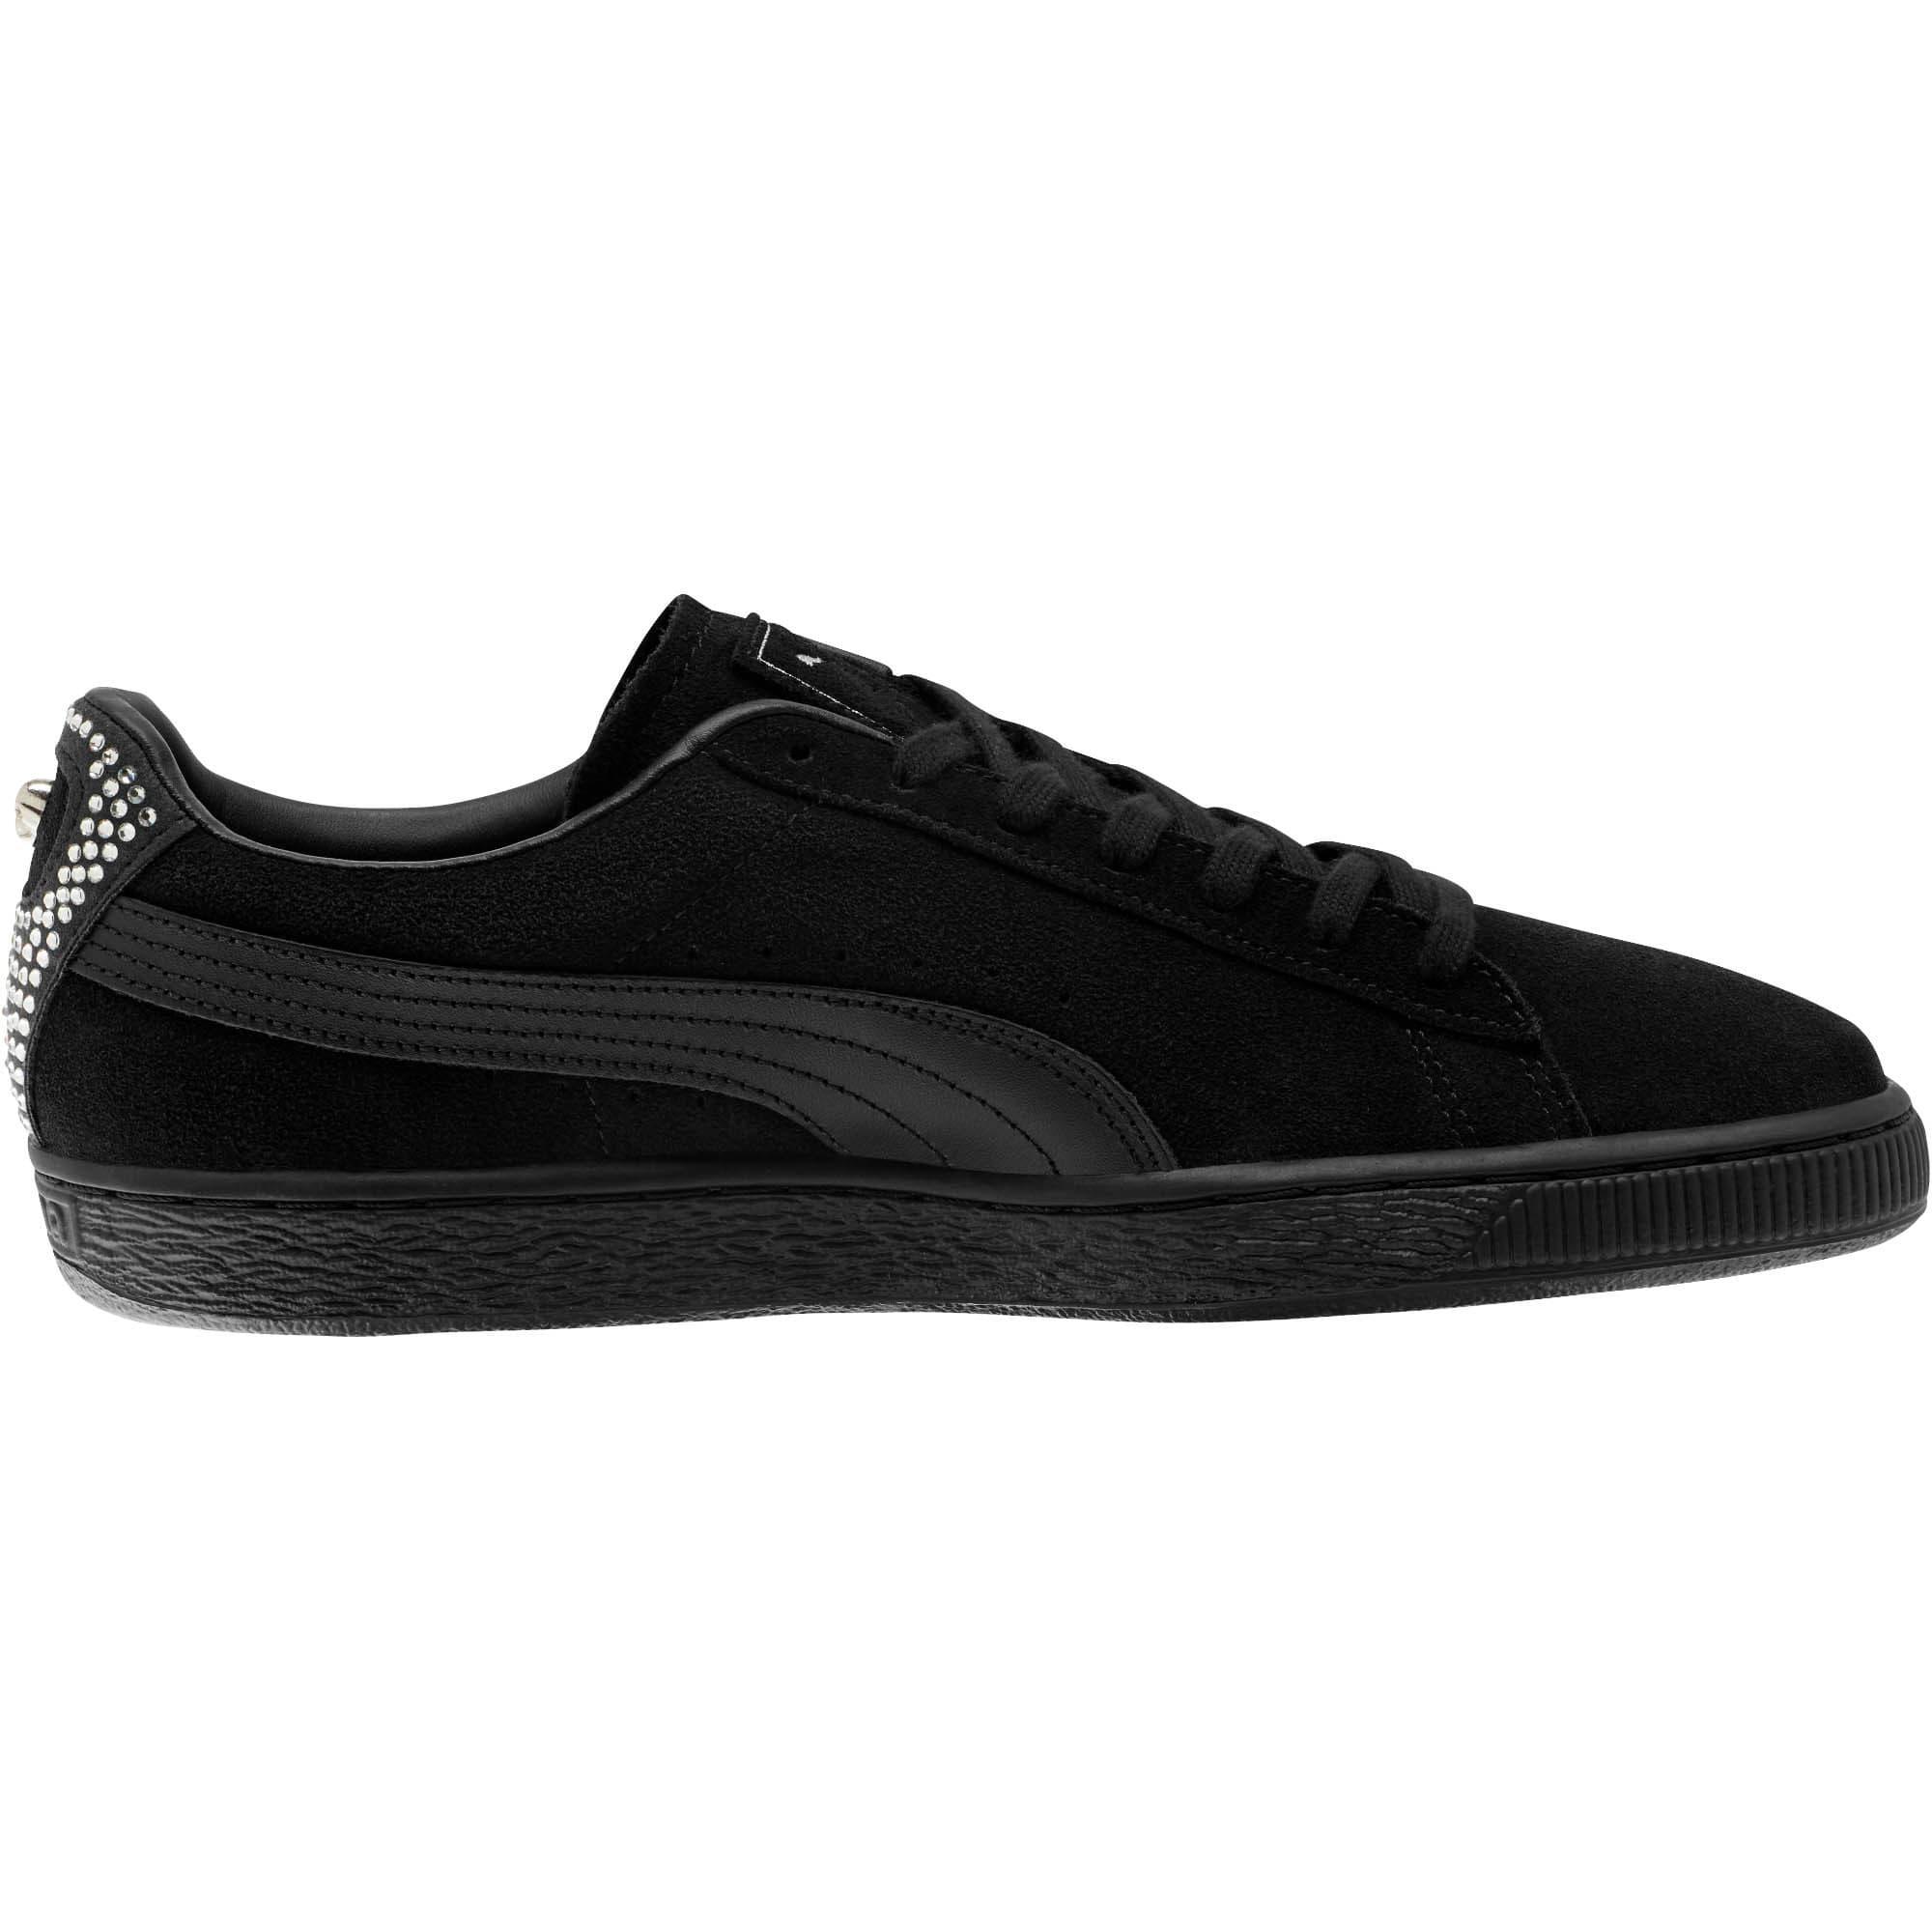 Miniatura 4 de Zapatos deportivos de gamuza PUMA x THE KOOPLES, Puma Black, mediano